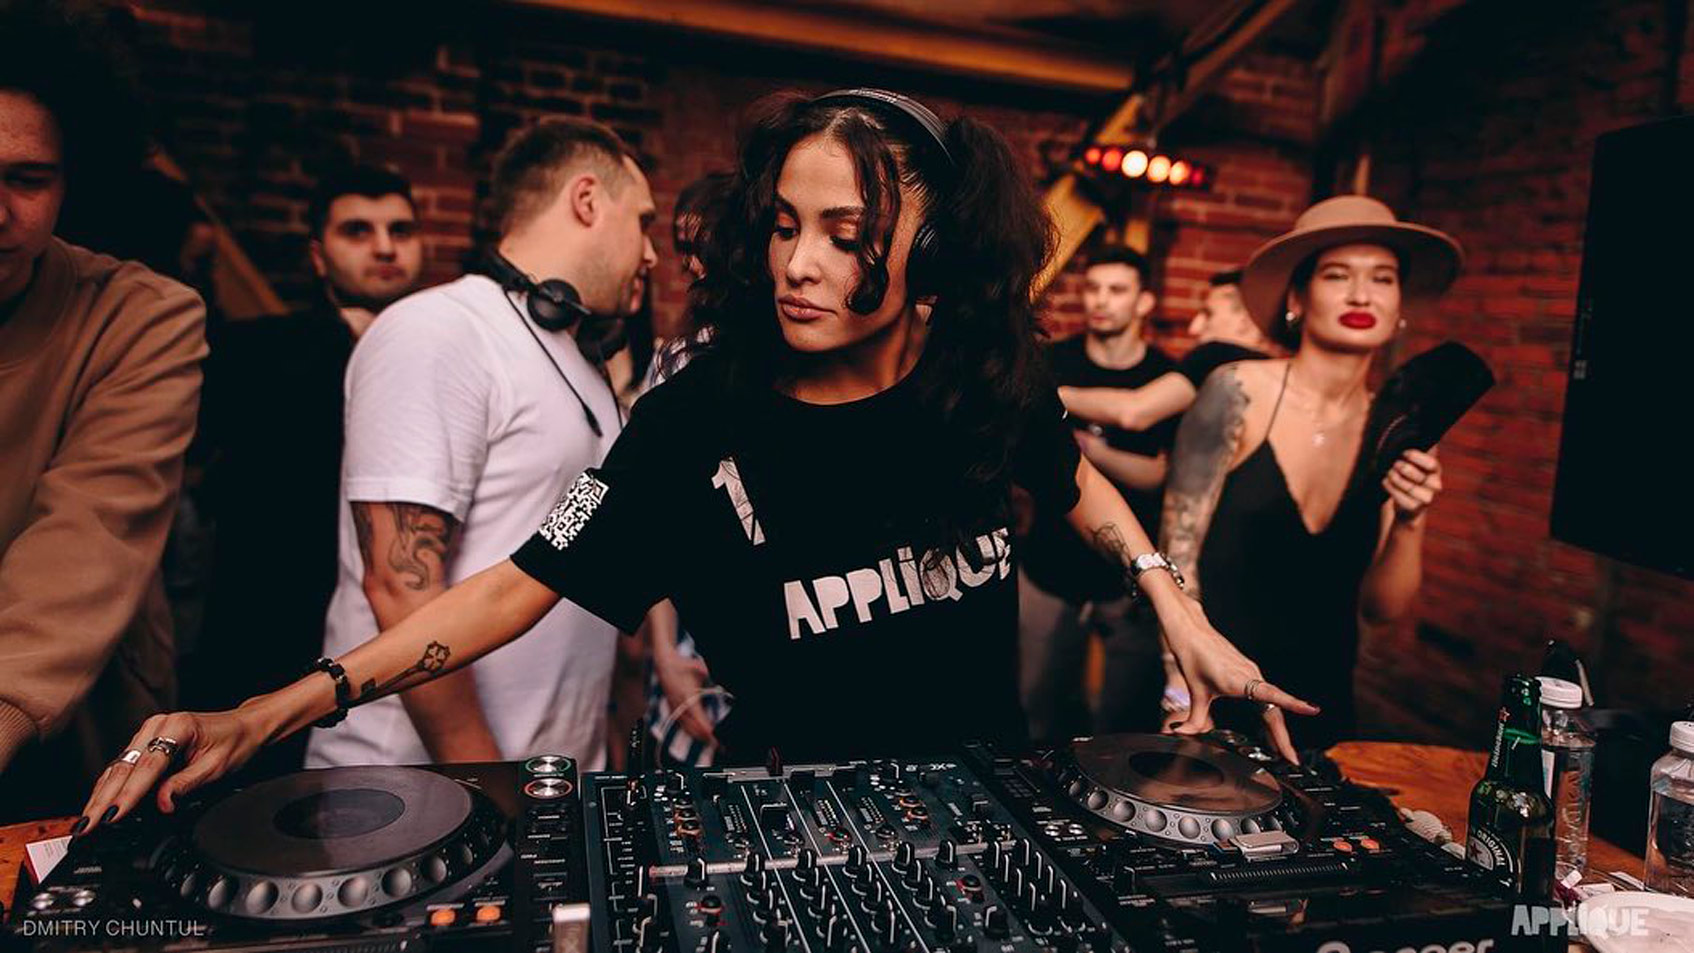 вечеринки applique records